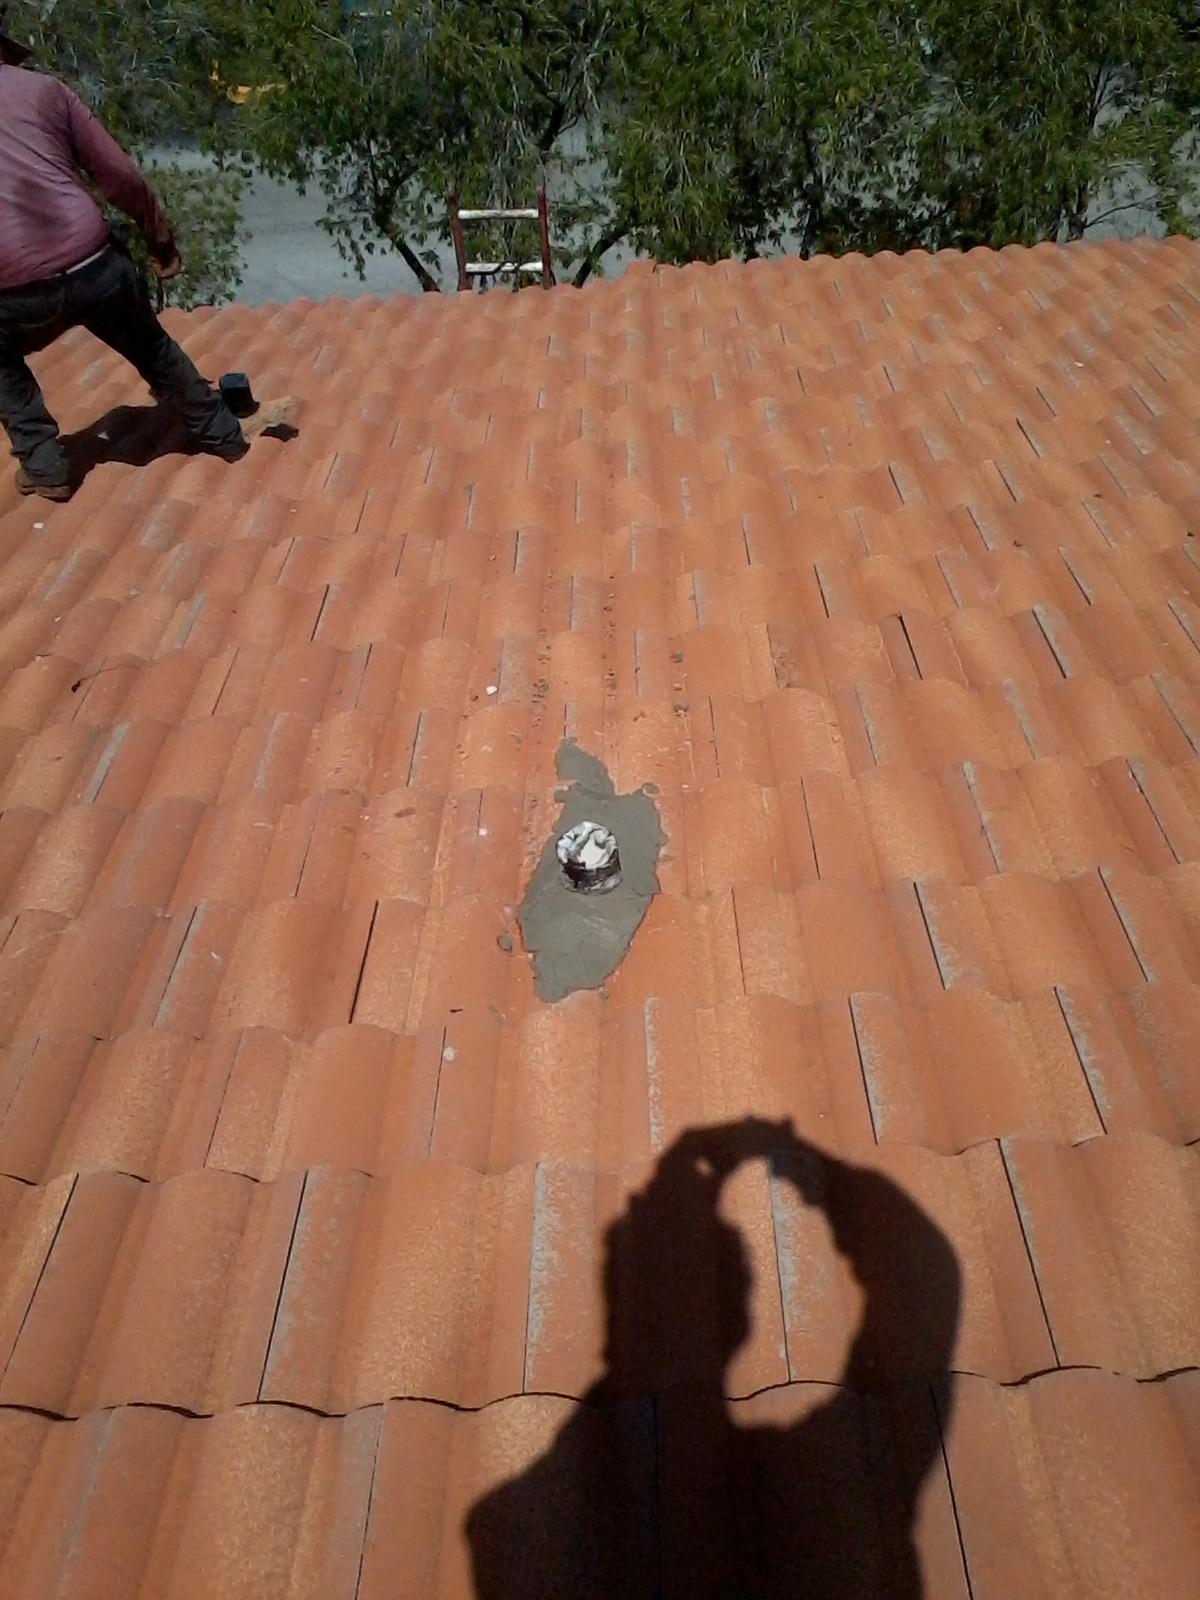 Roof Leak Repair Cost Preventive Maintenance